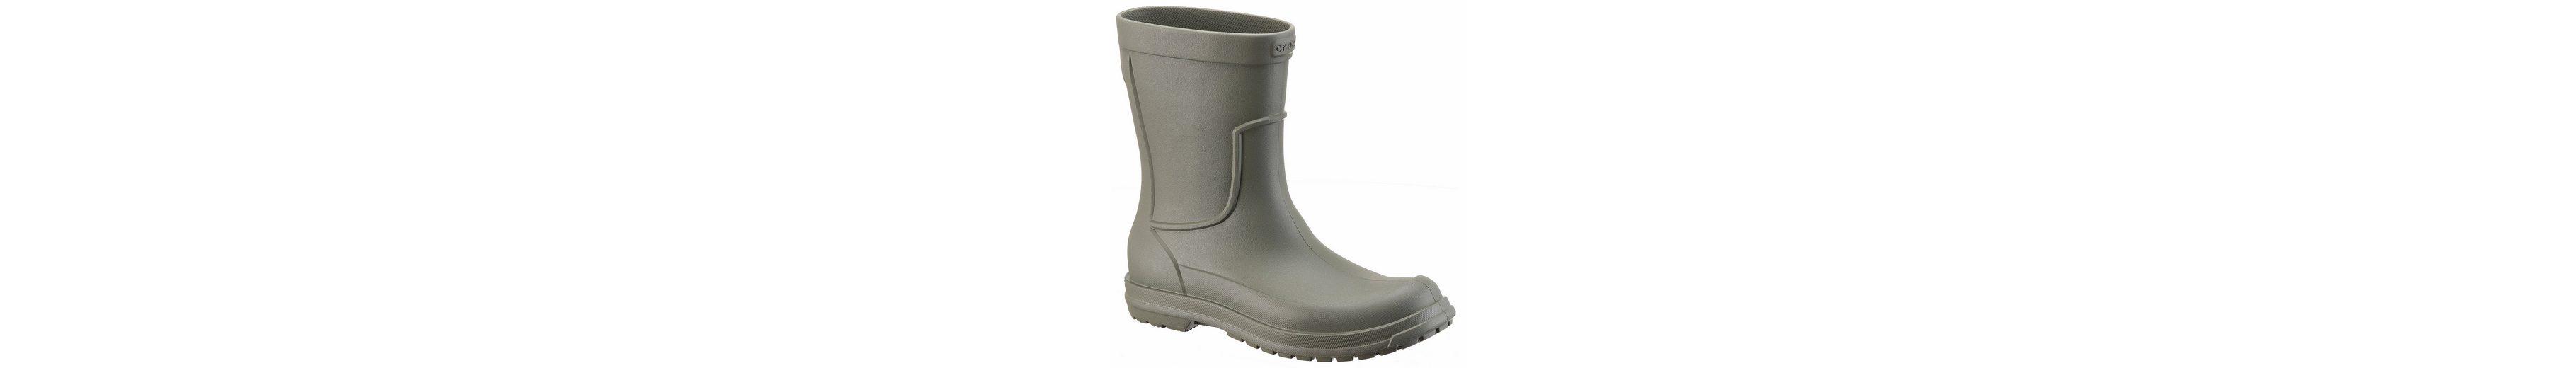 Crocs All Cast Rain Boot M Gummistiefel, mit Profillaufsohle